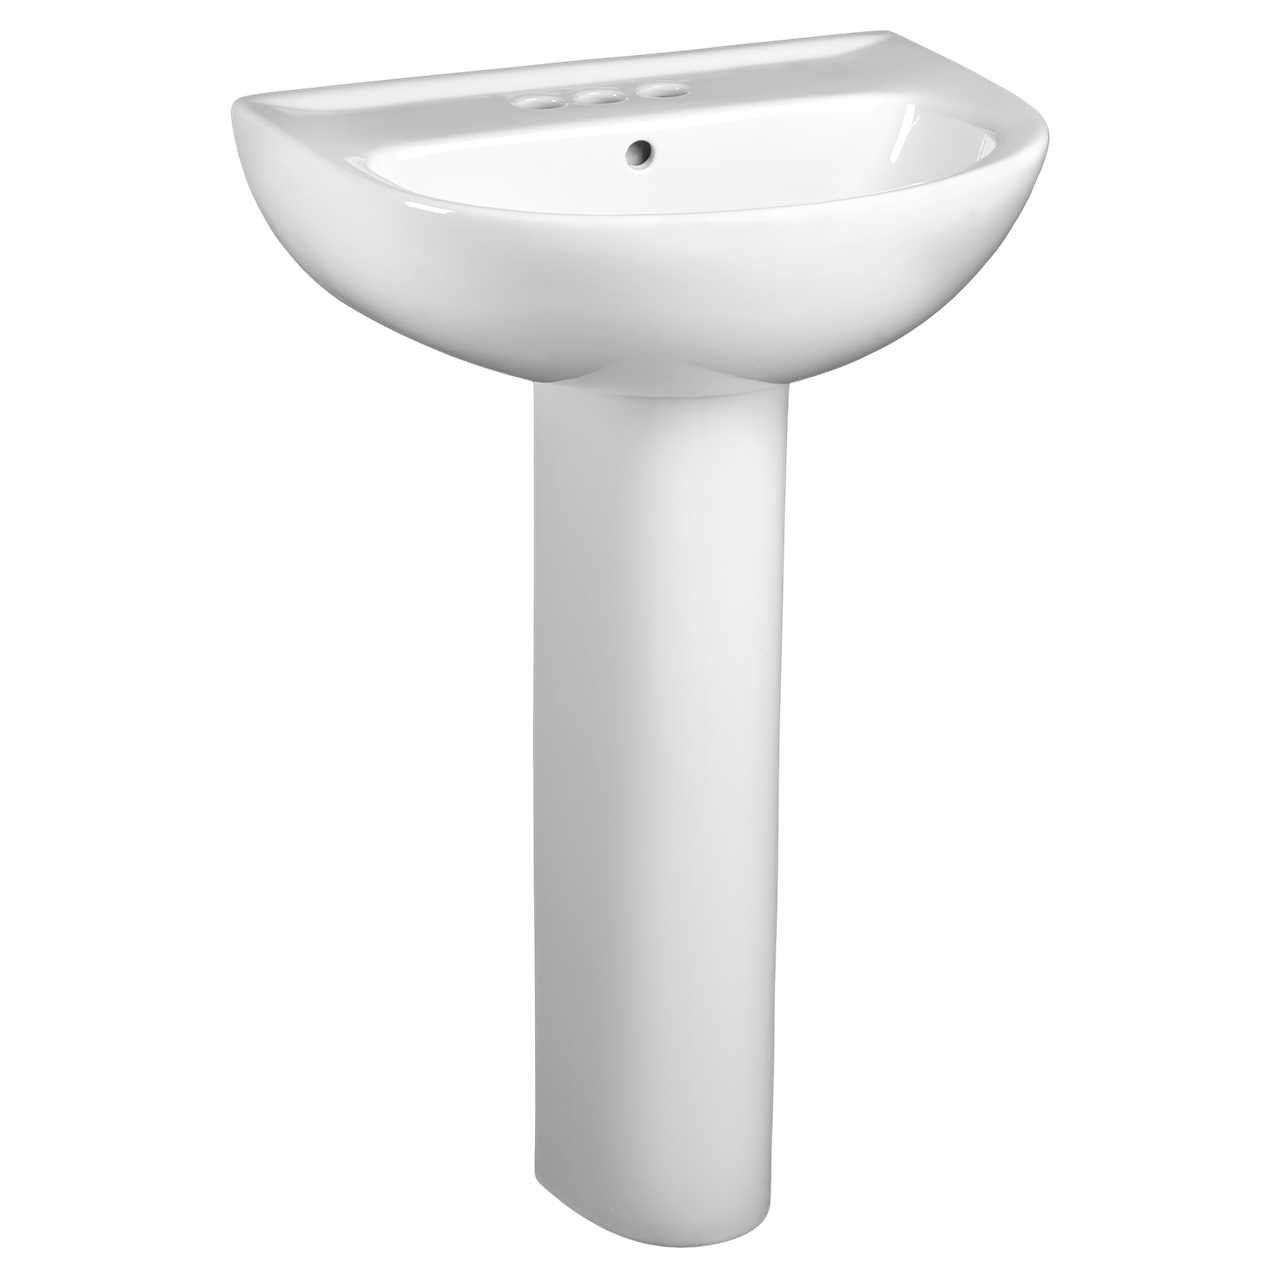 - Sinks